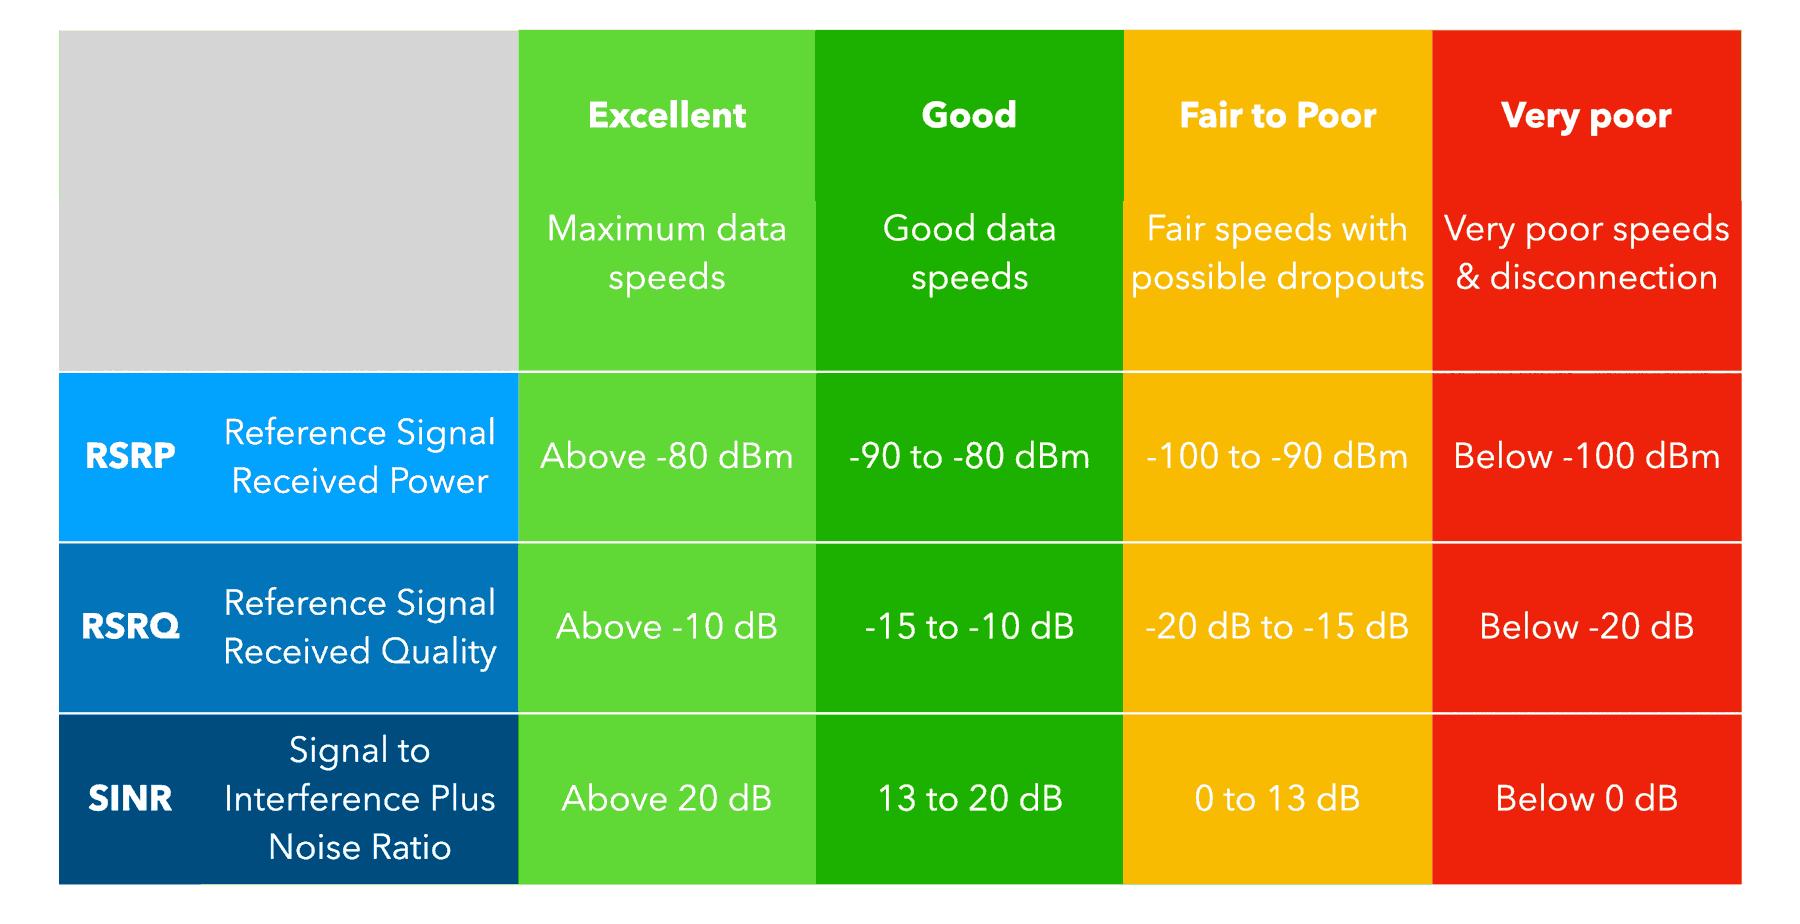 4G performance